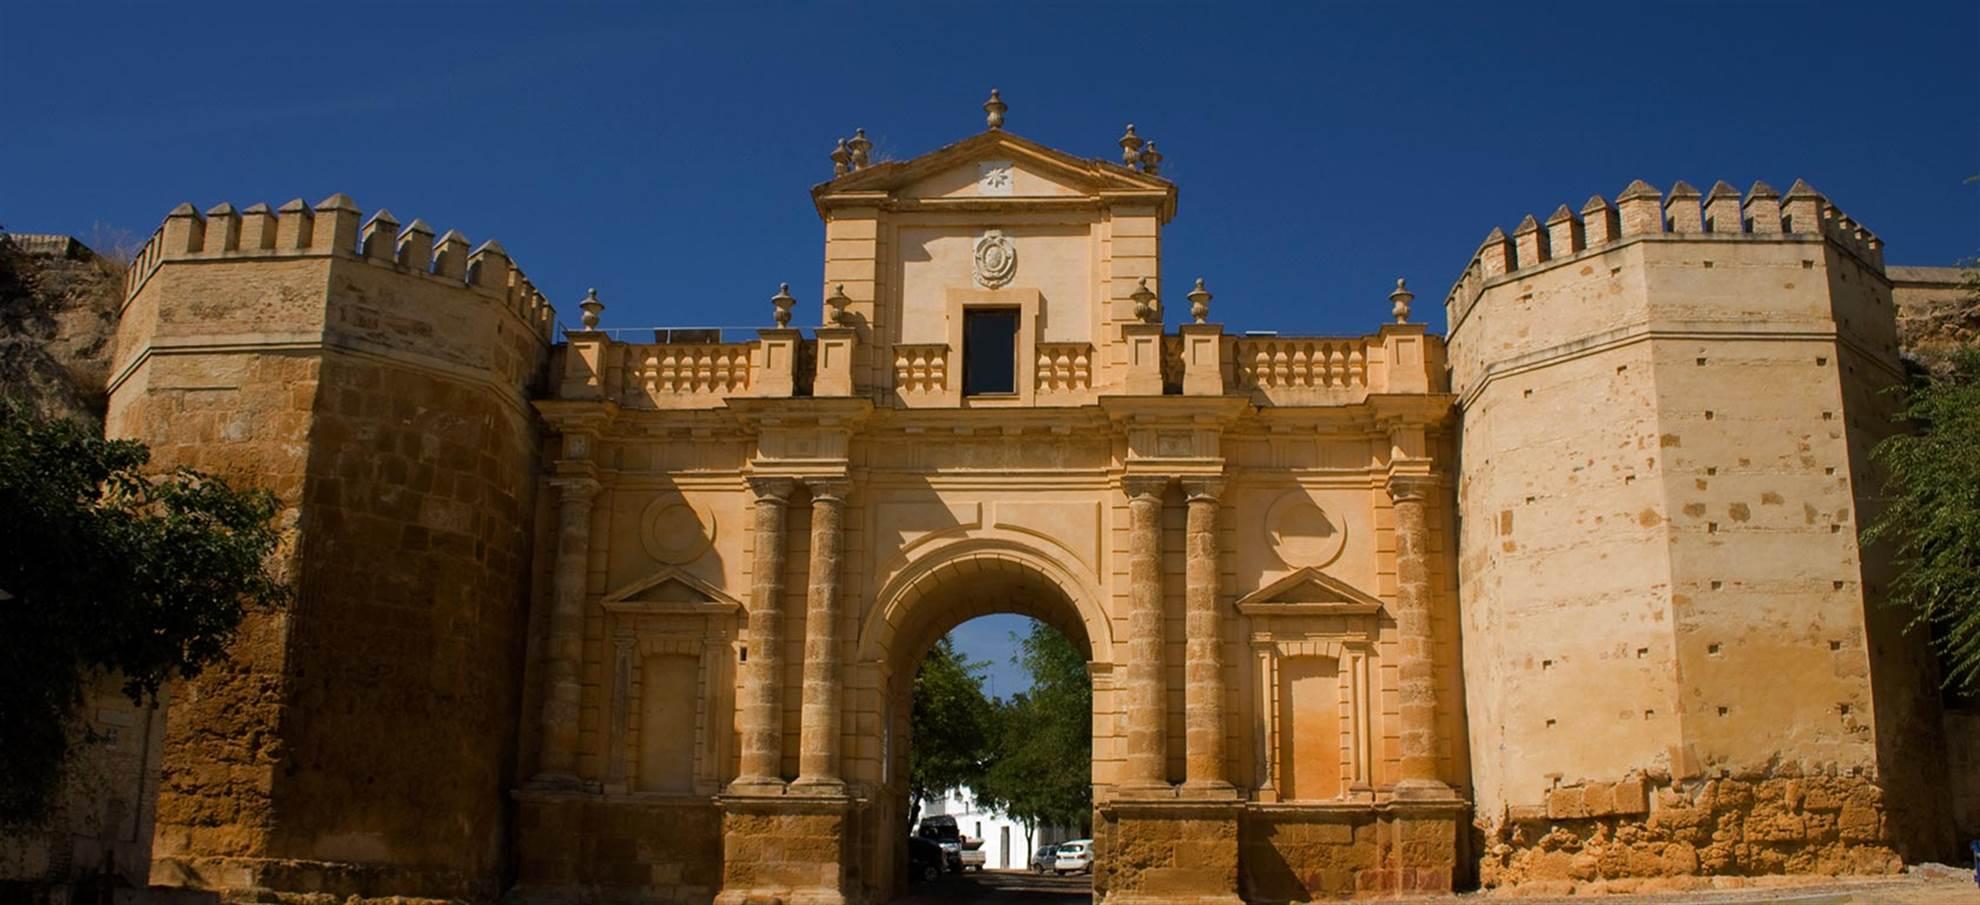 Carmona, berceau des civilisations (SVQCARMO)